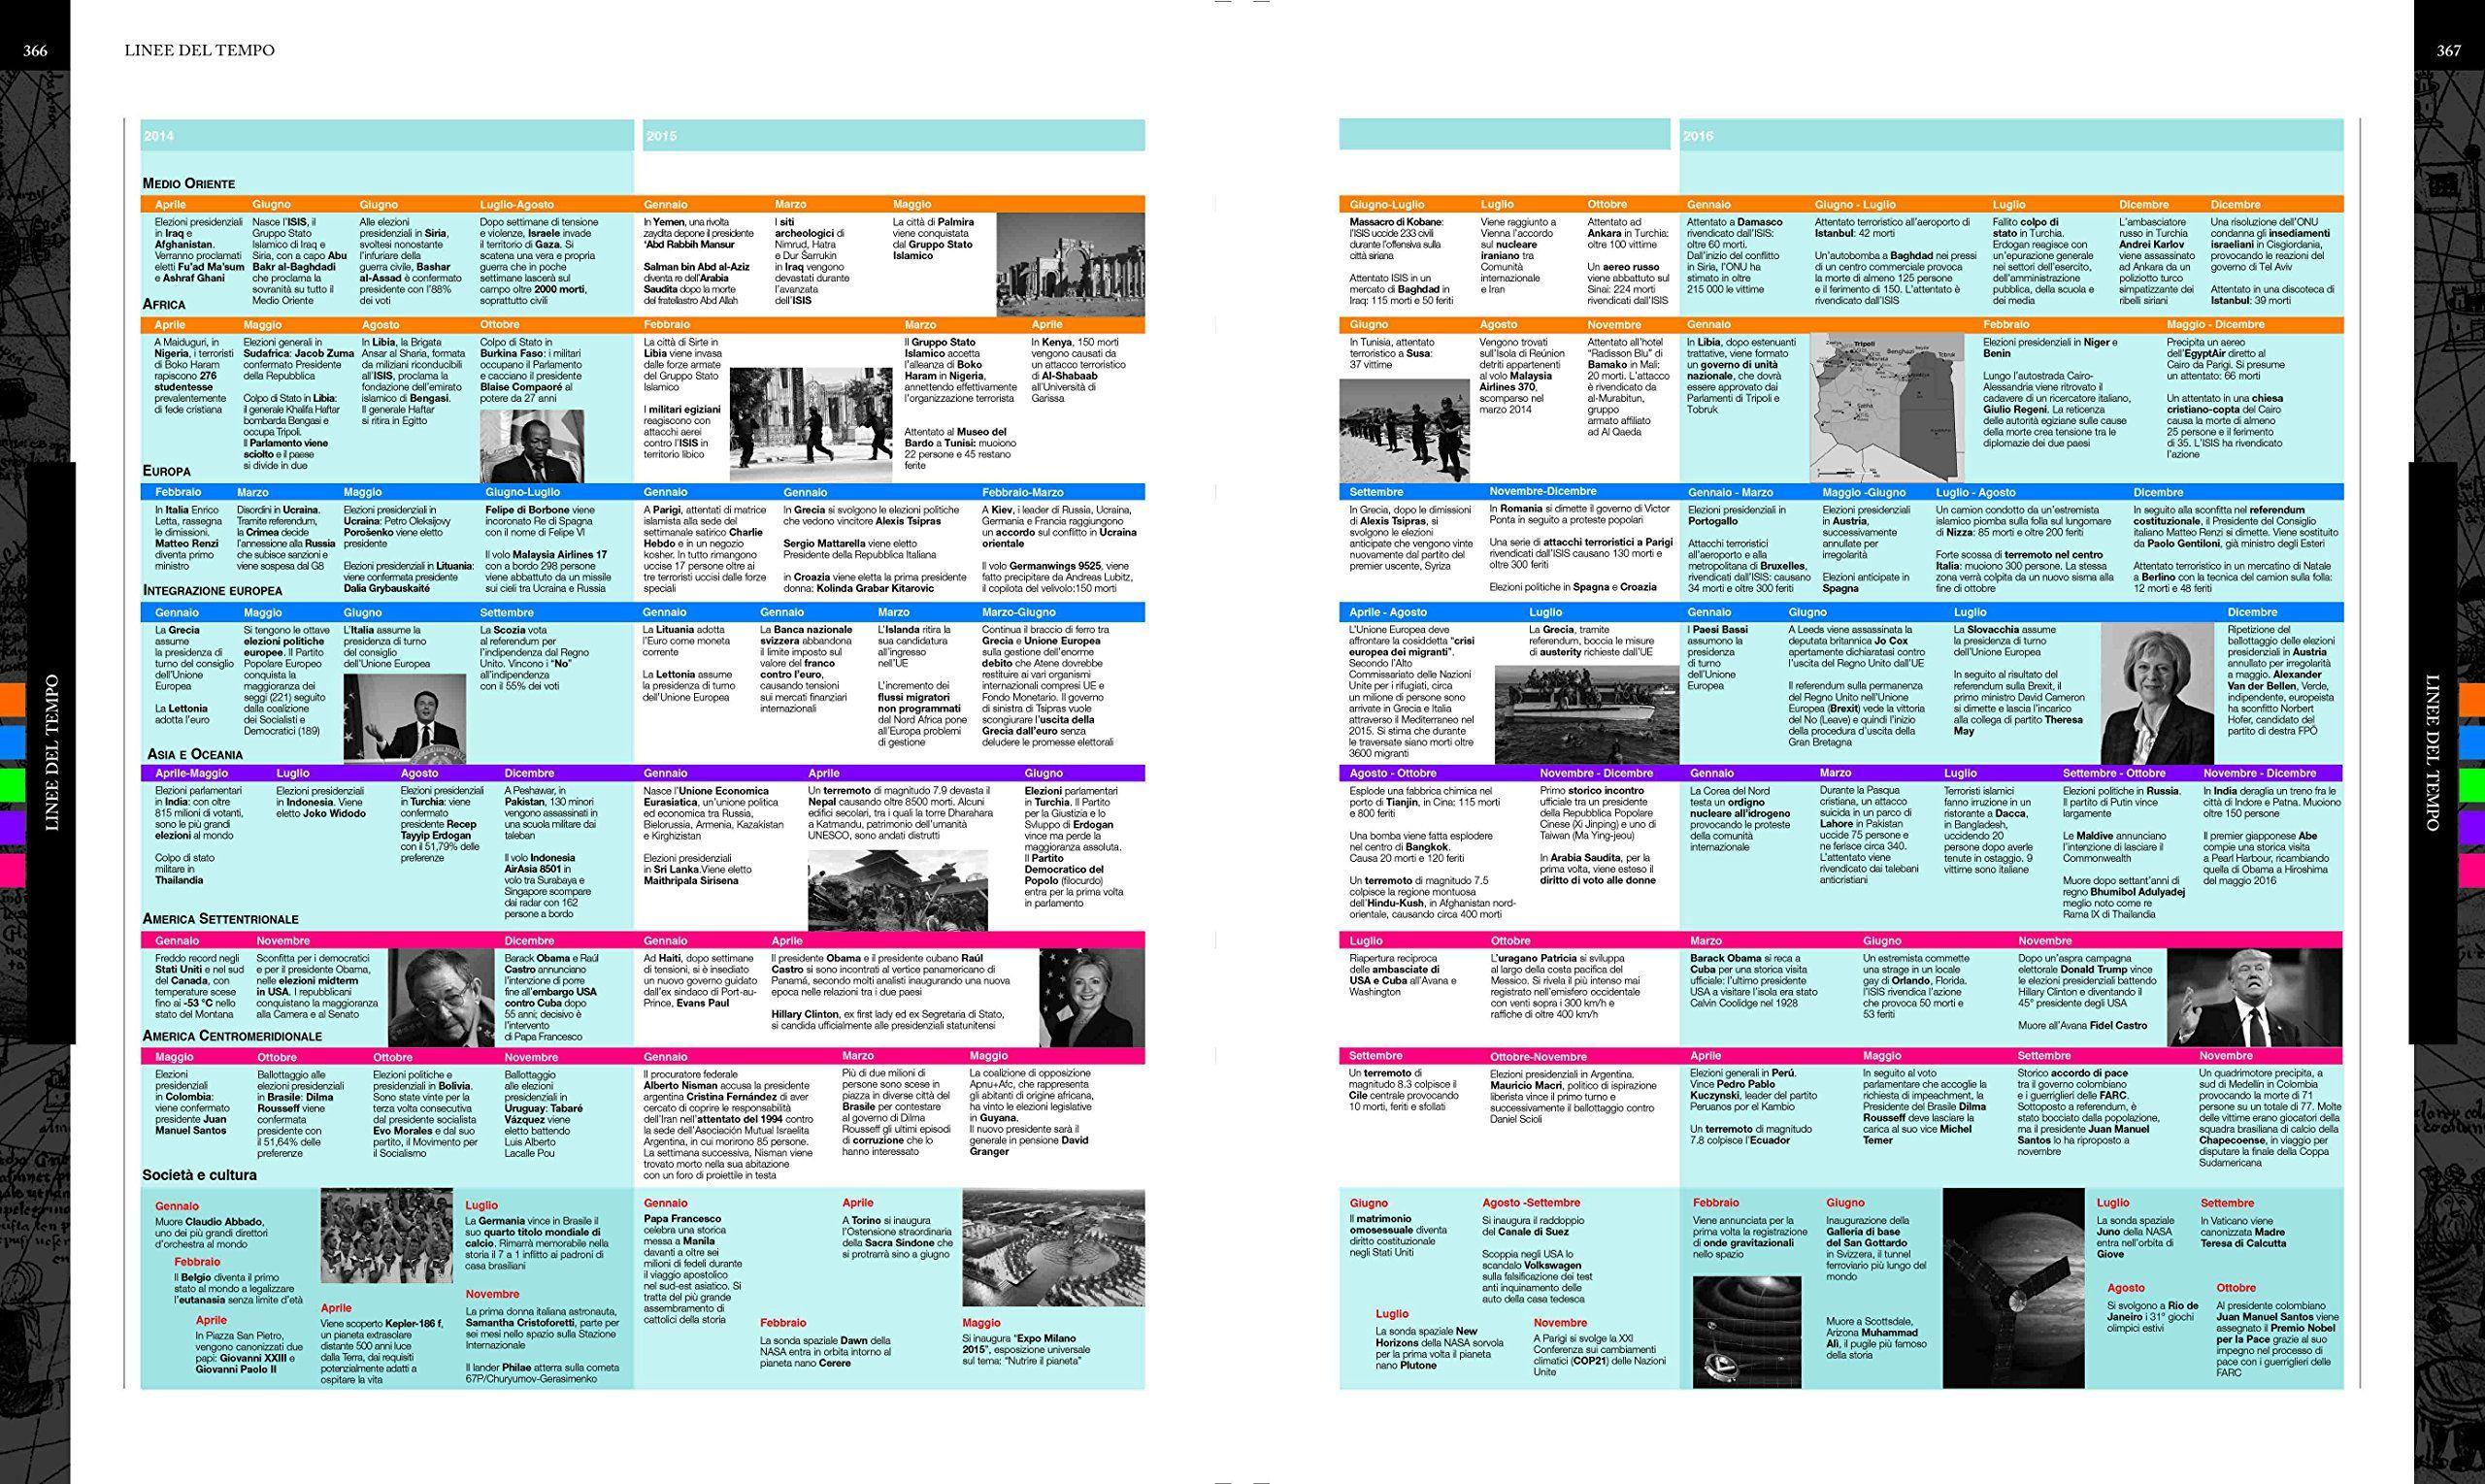 Atlante Storico Con Timeline Digitale Con Espansione Online Con